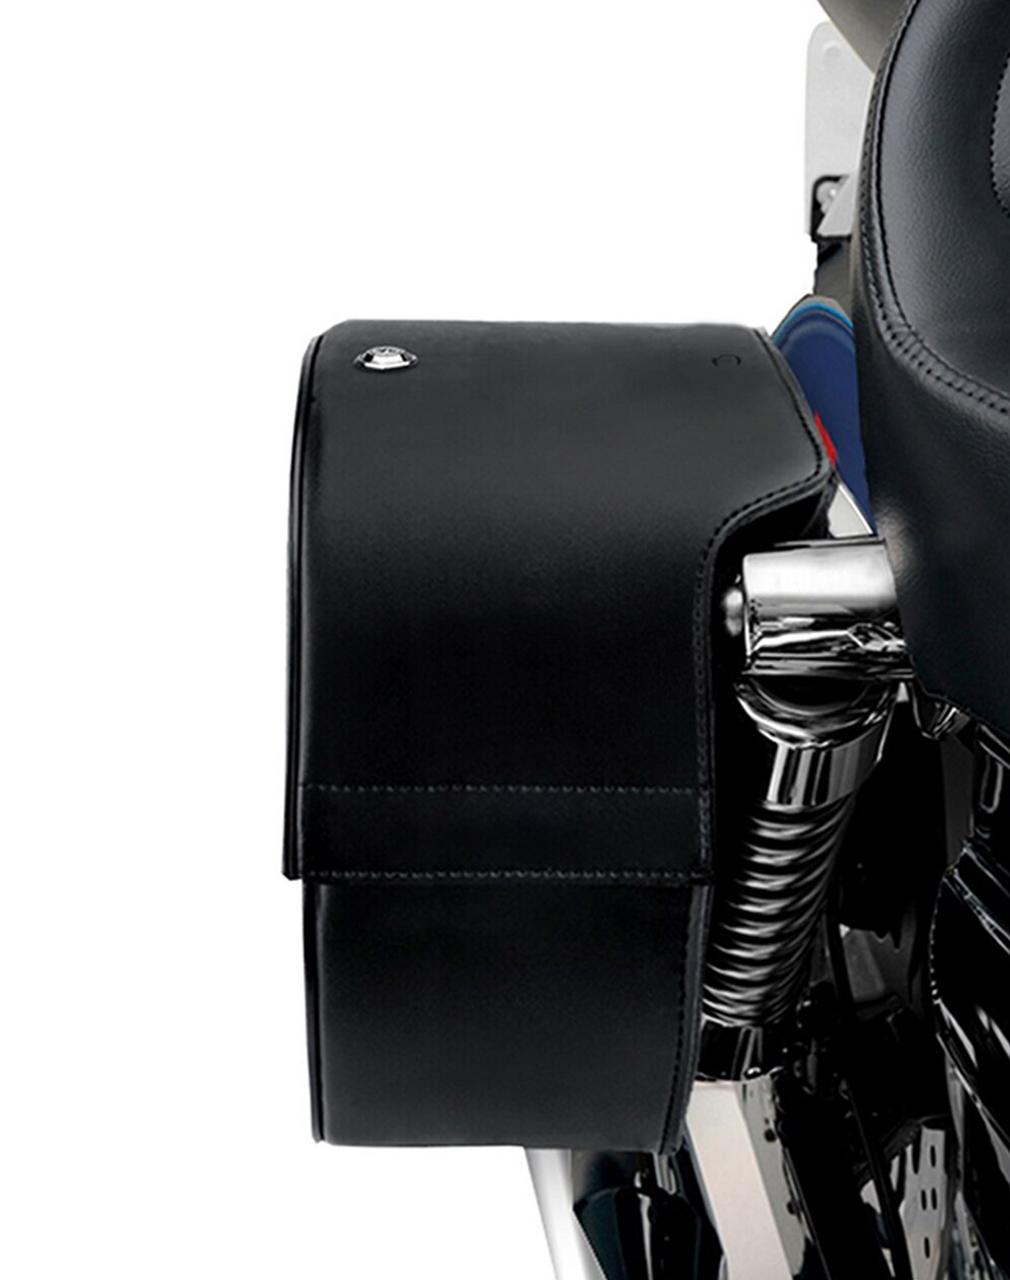 Kawasaki Eliminator 125 Shock Cutout Slanted Studded SS Large Motorcycle Saddlebags Shock Cutout View